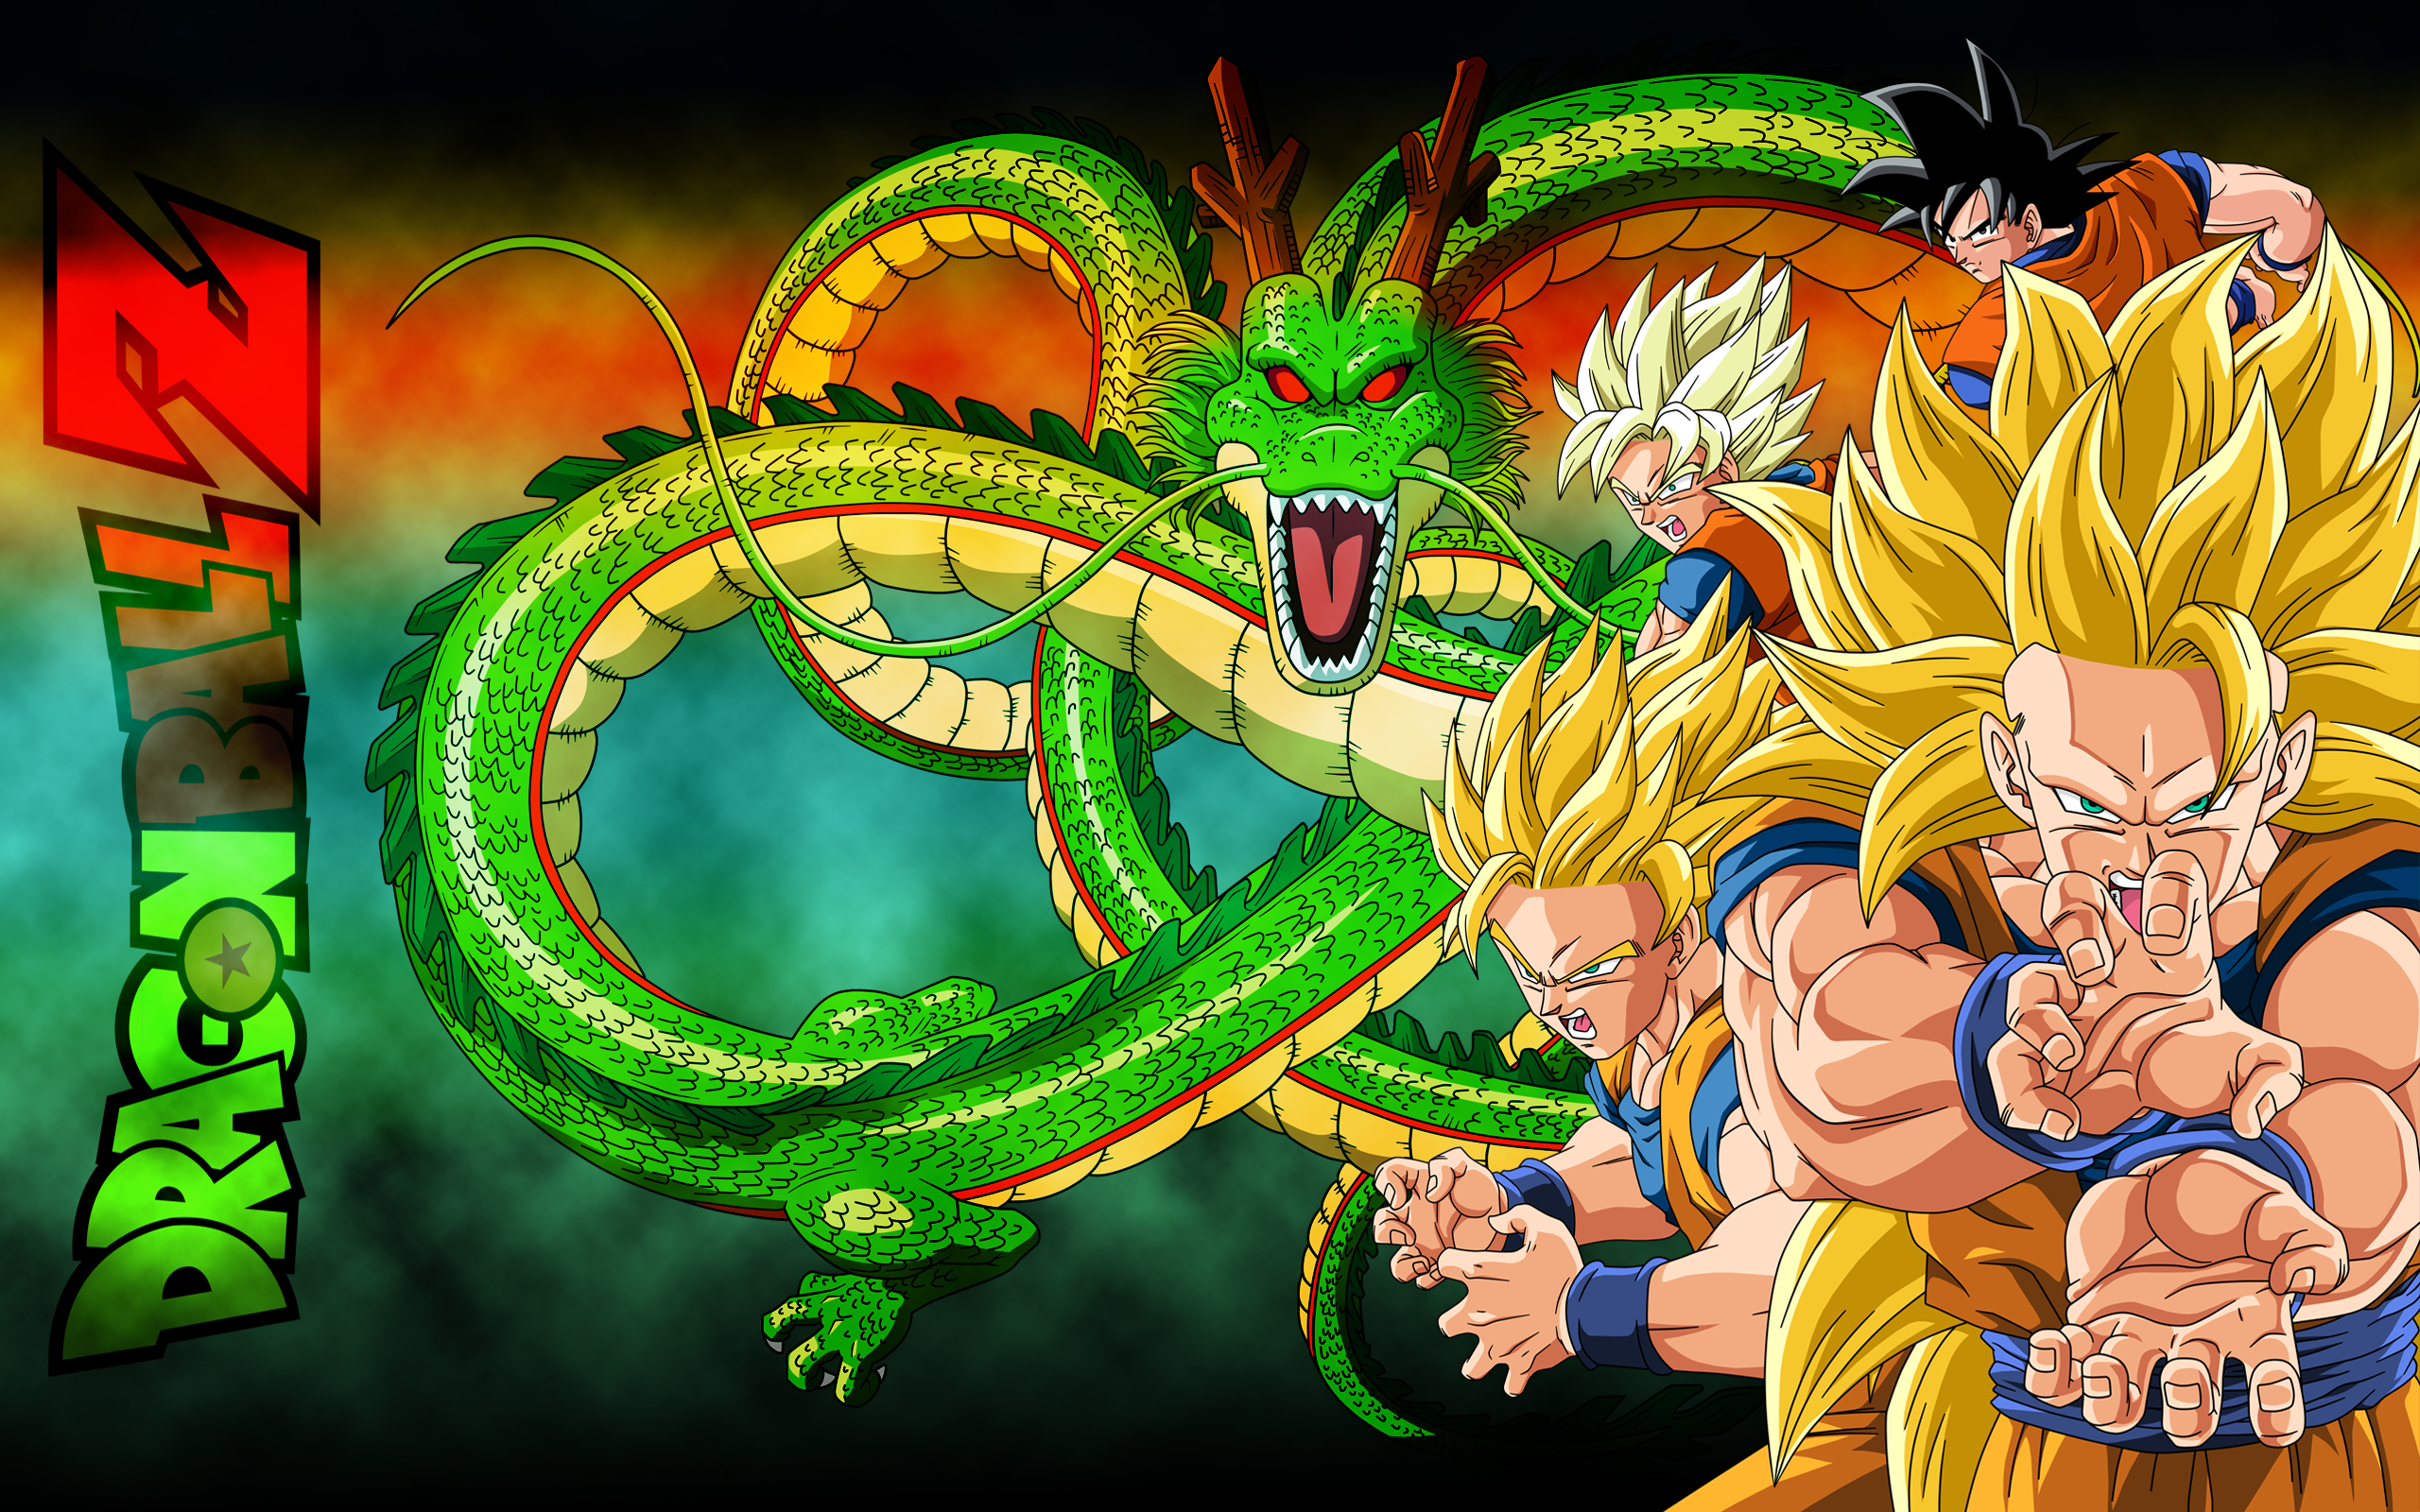 Gokus Journey